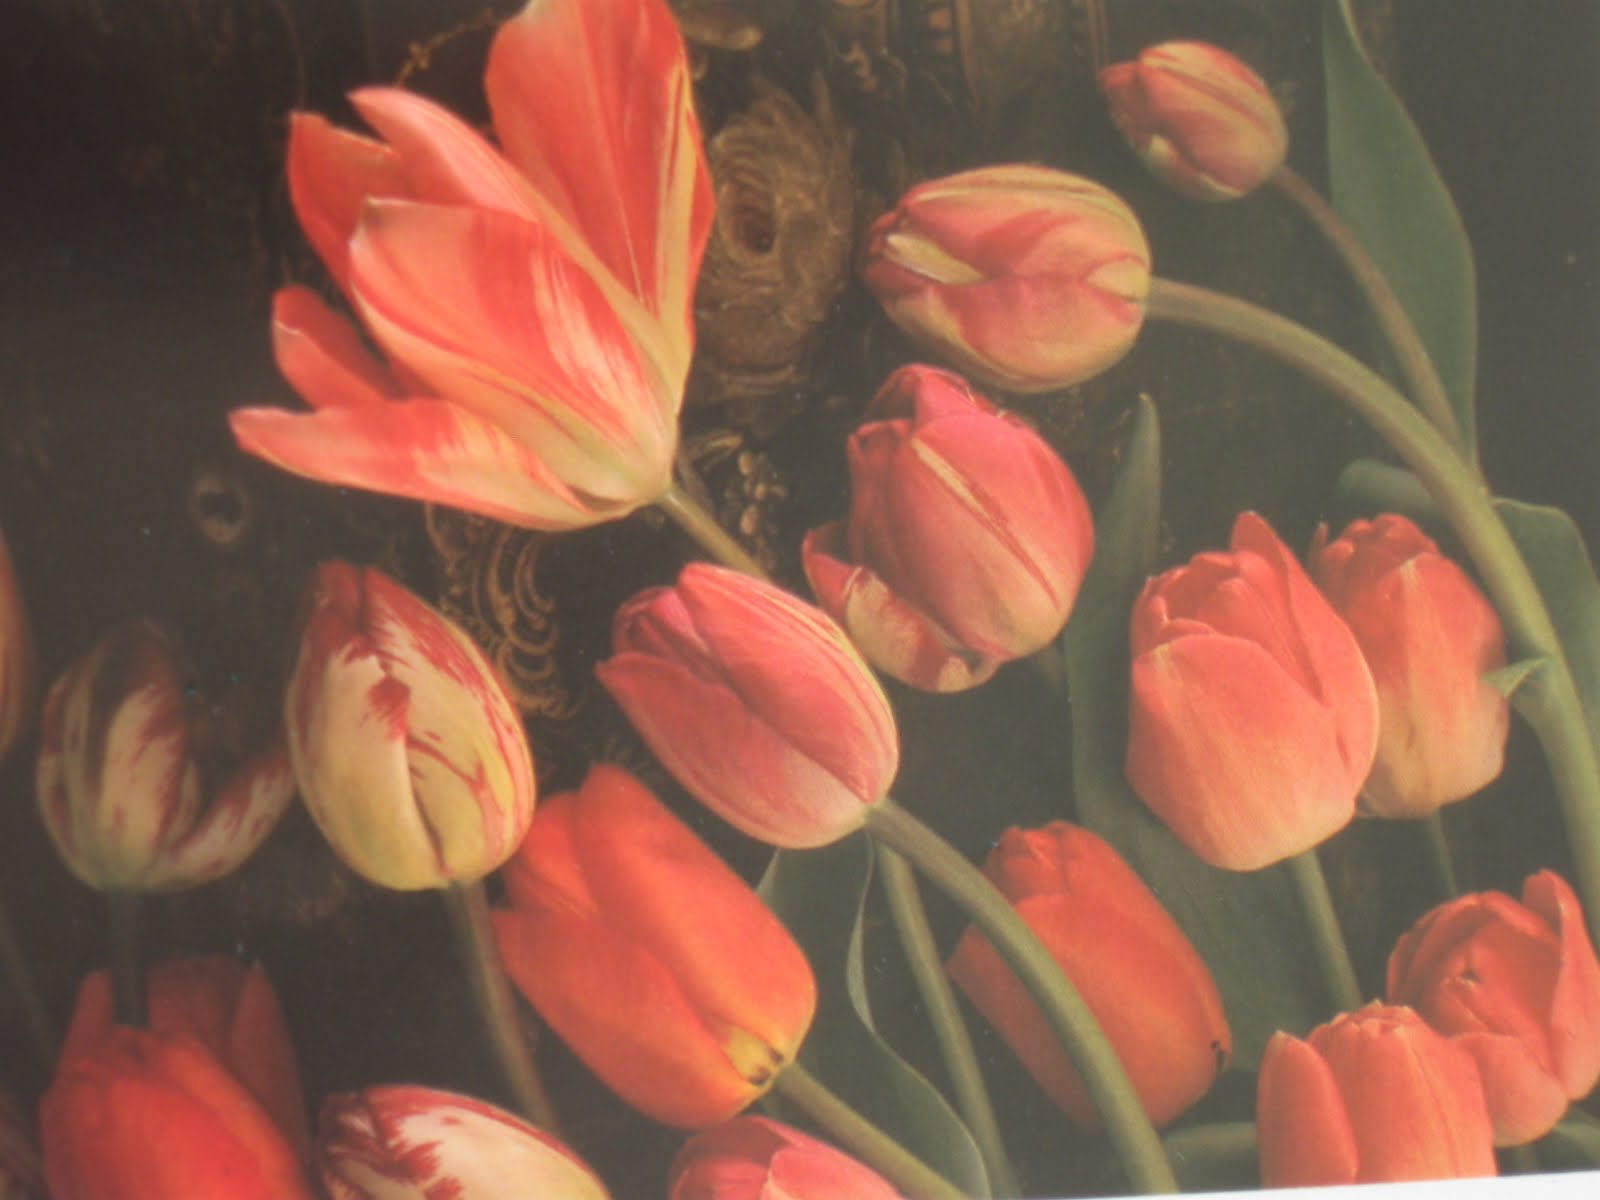 Blomsterbo: boktips från blomsterbo; 1